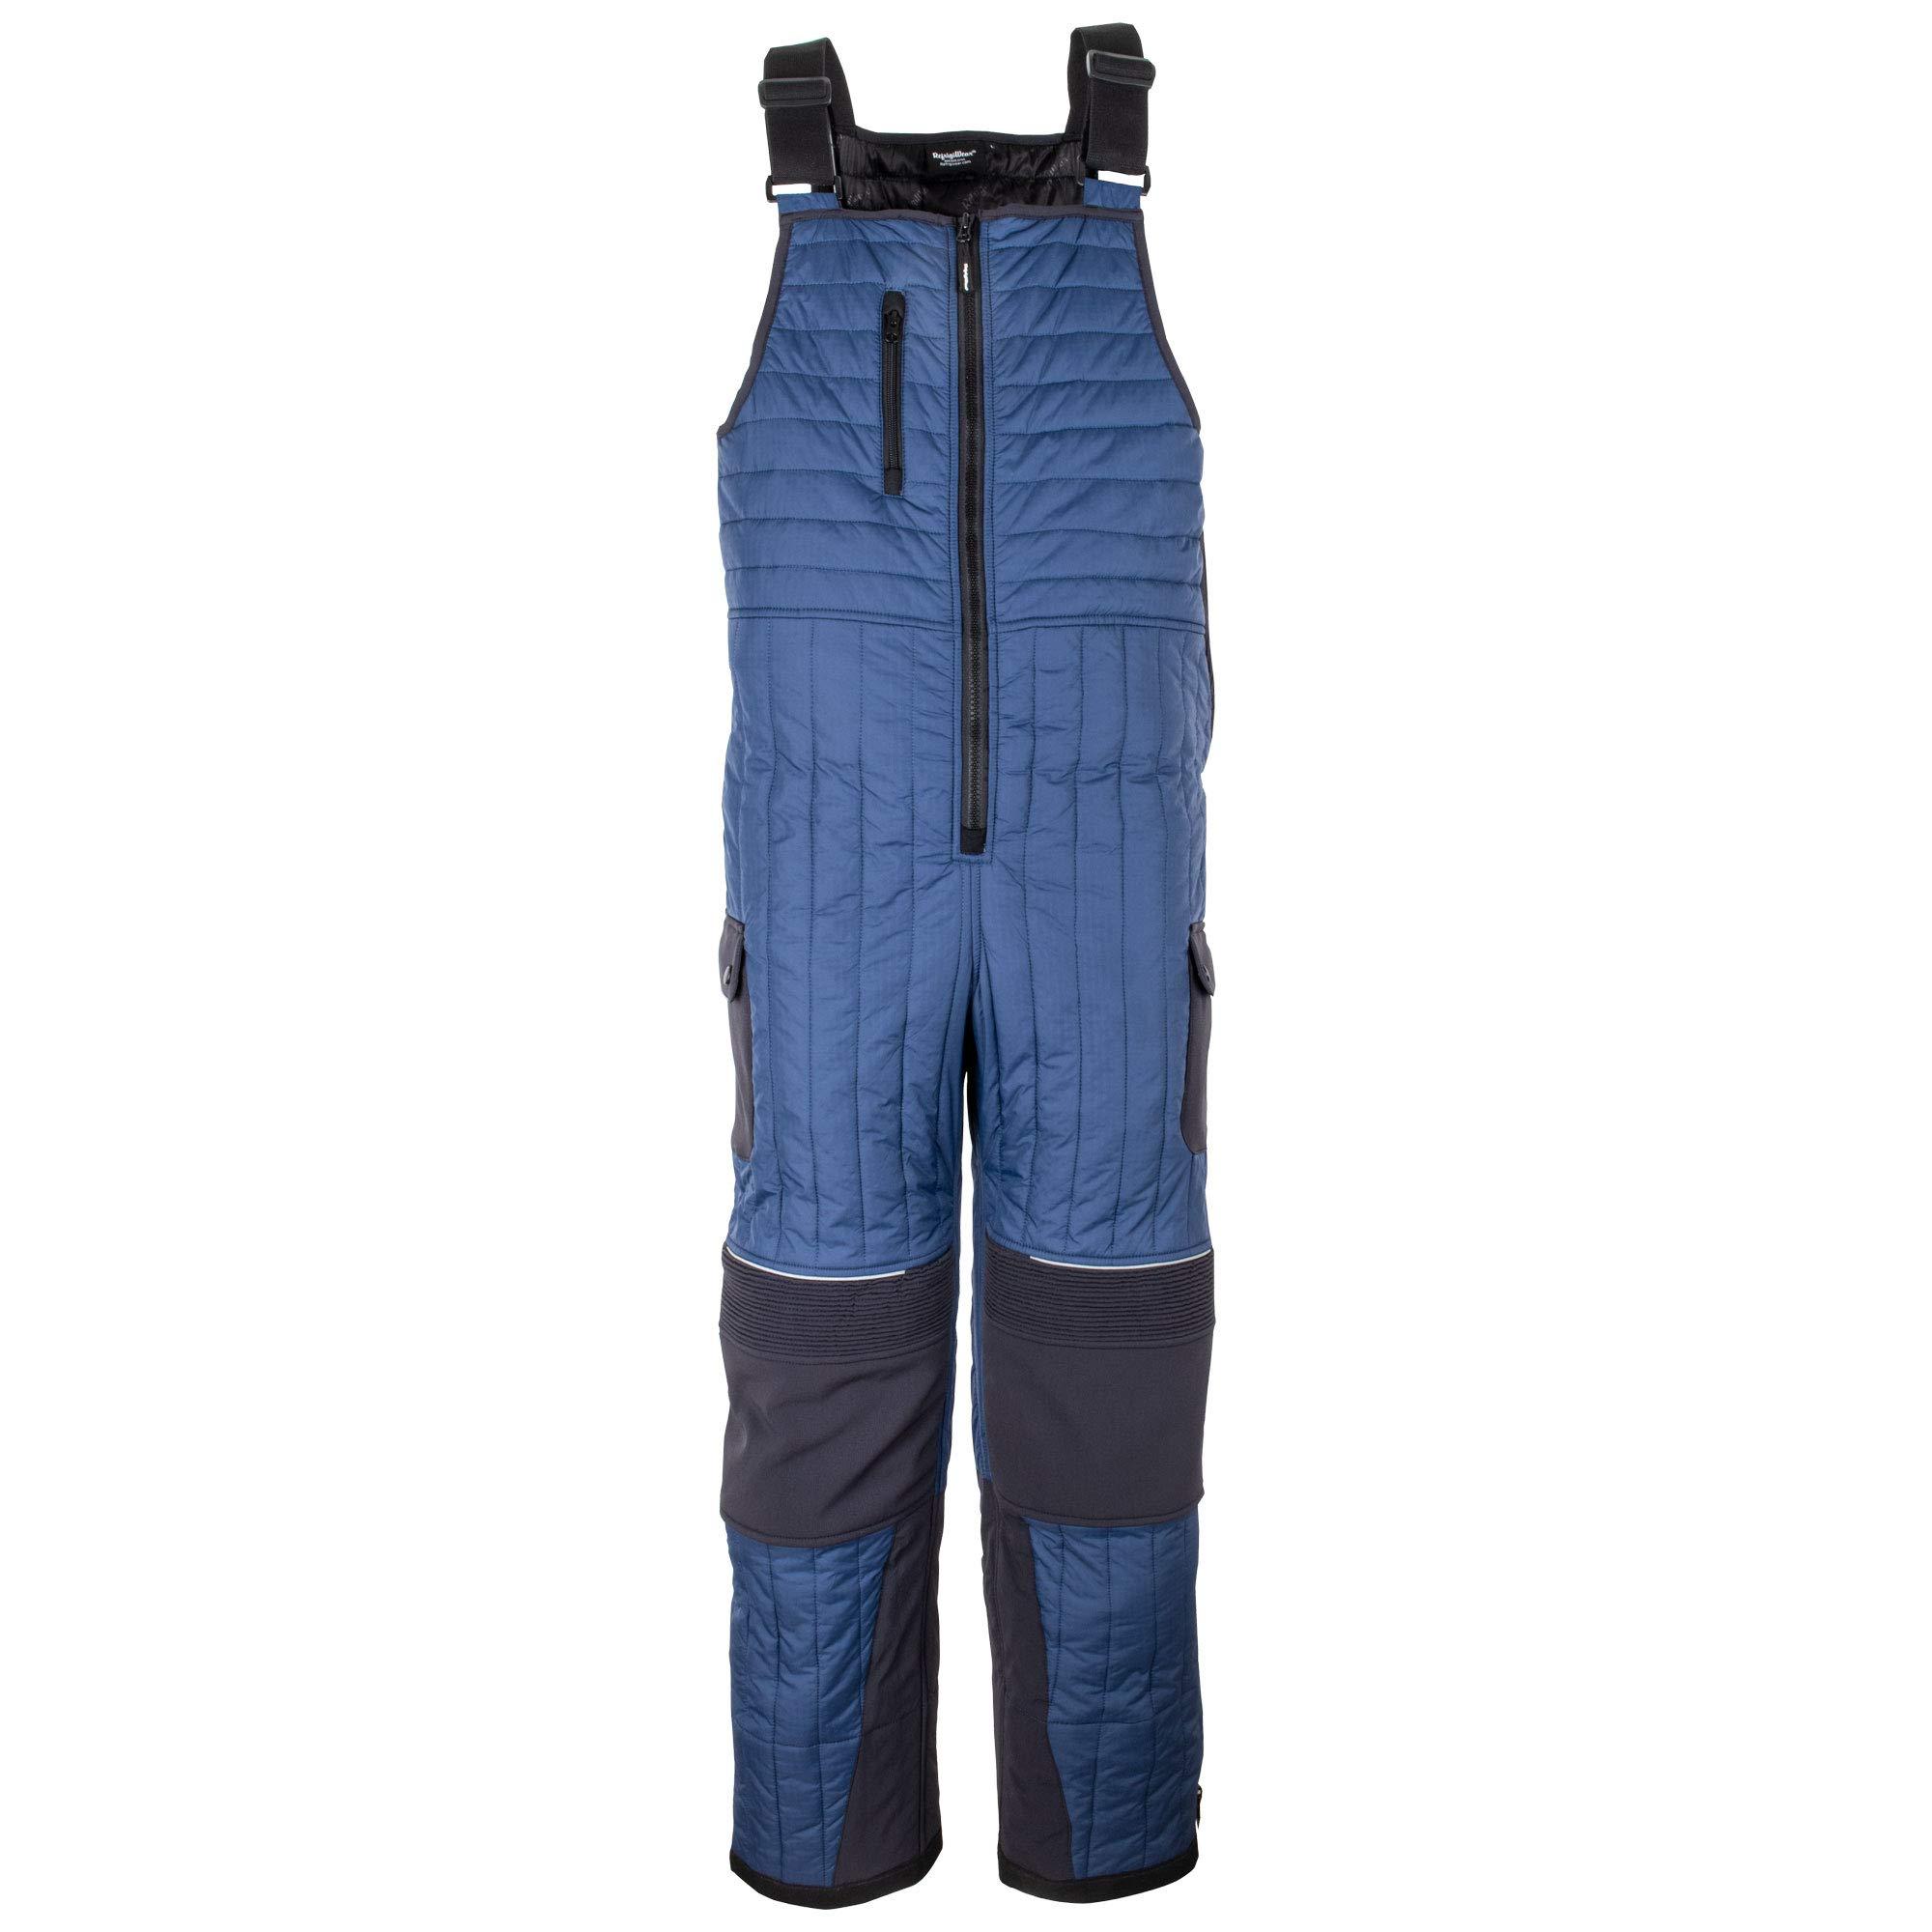 RefrigiWear Men's Frostline Insulated Bib Overalls with Performance-Flex